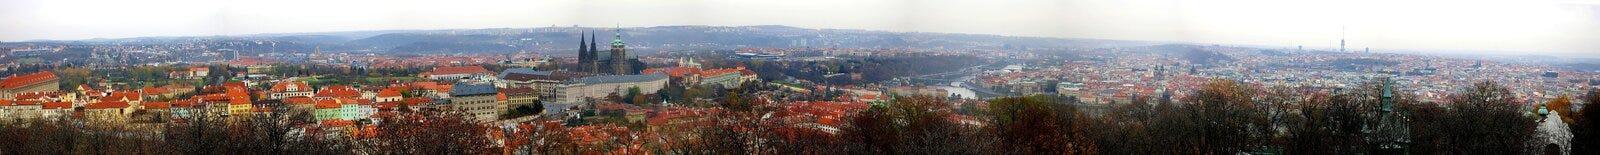 petrin Πράγα πανοράματος Στοκ φωτογραφίες με δικαίωμα ελεύθερης χρήσης